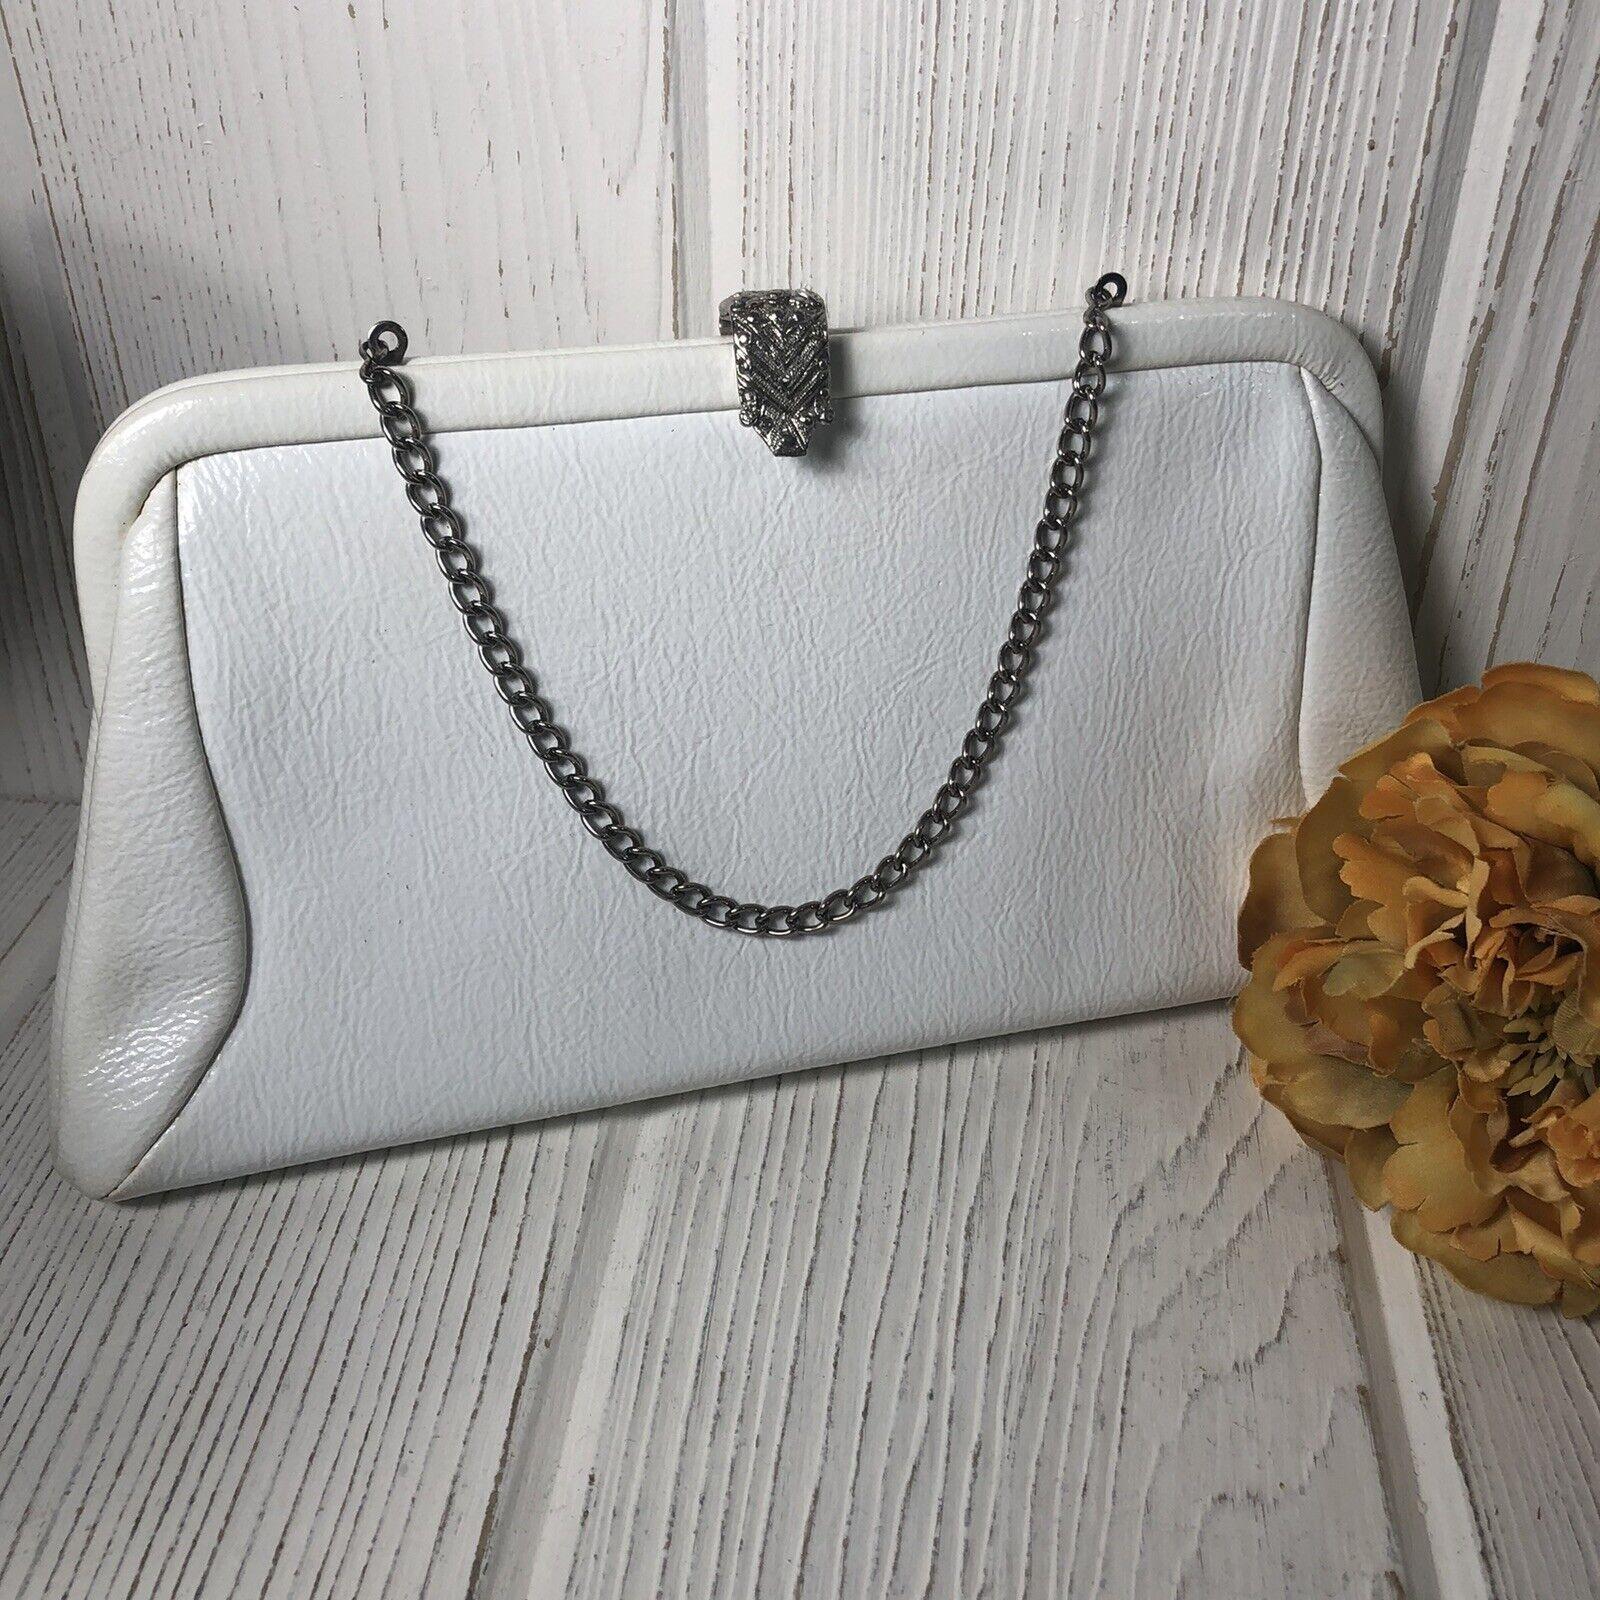 Vintage White Vinyl Purse Bag Clutch Chain Strap